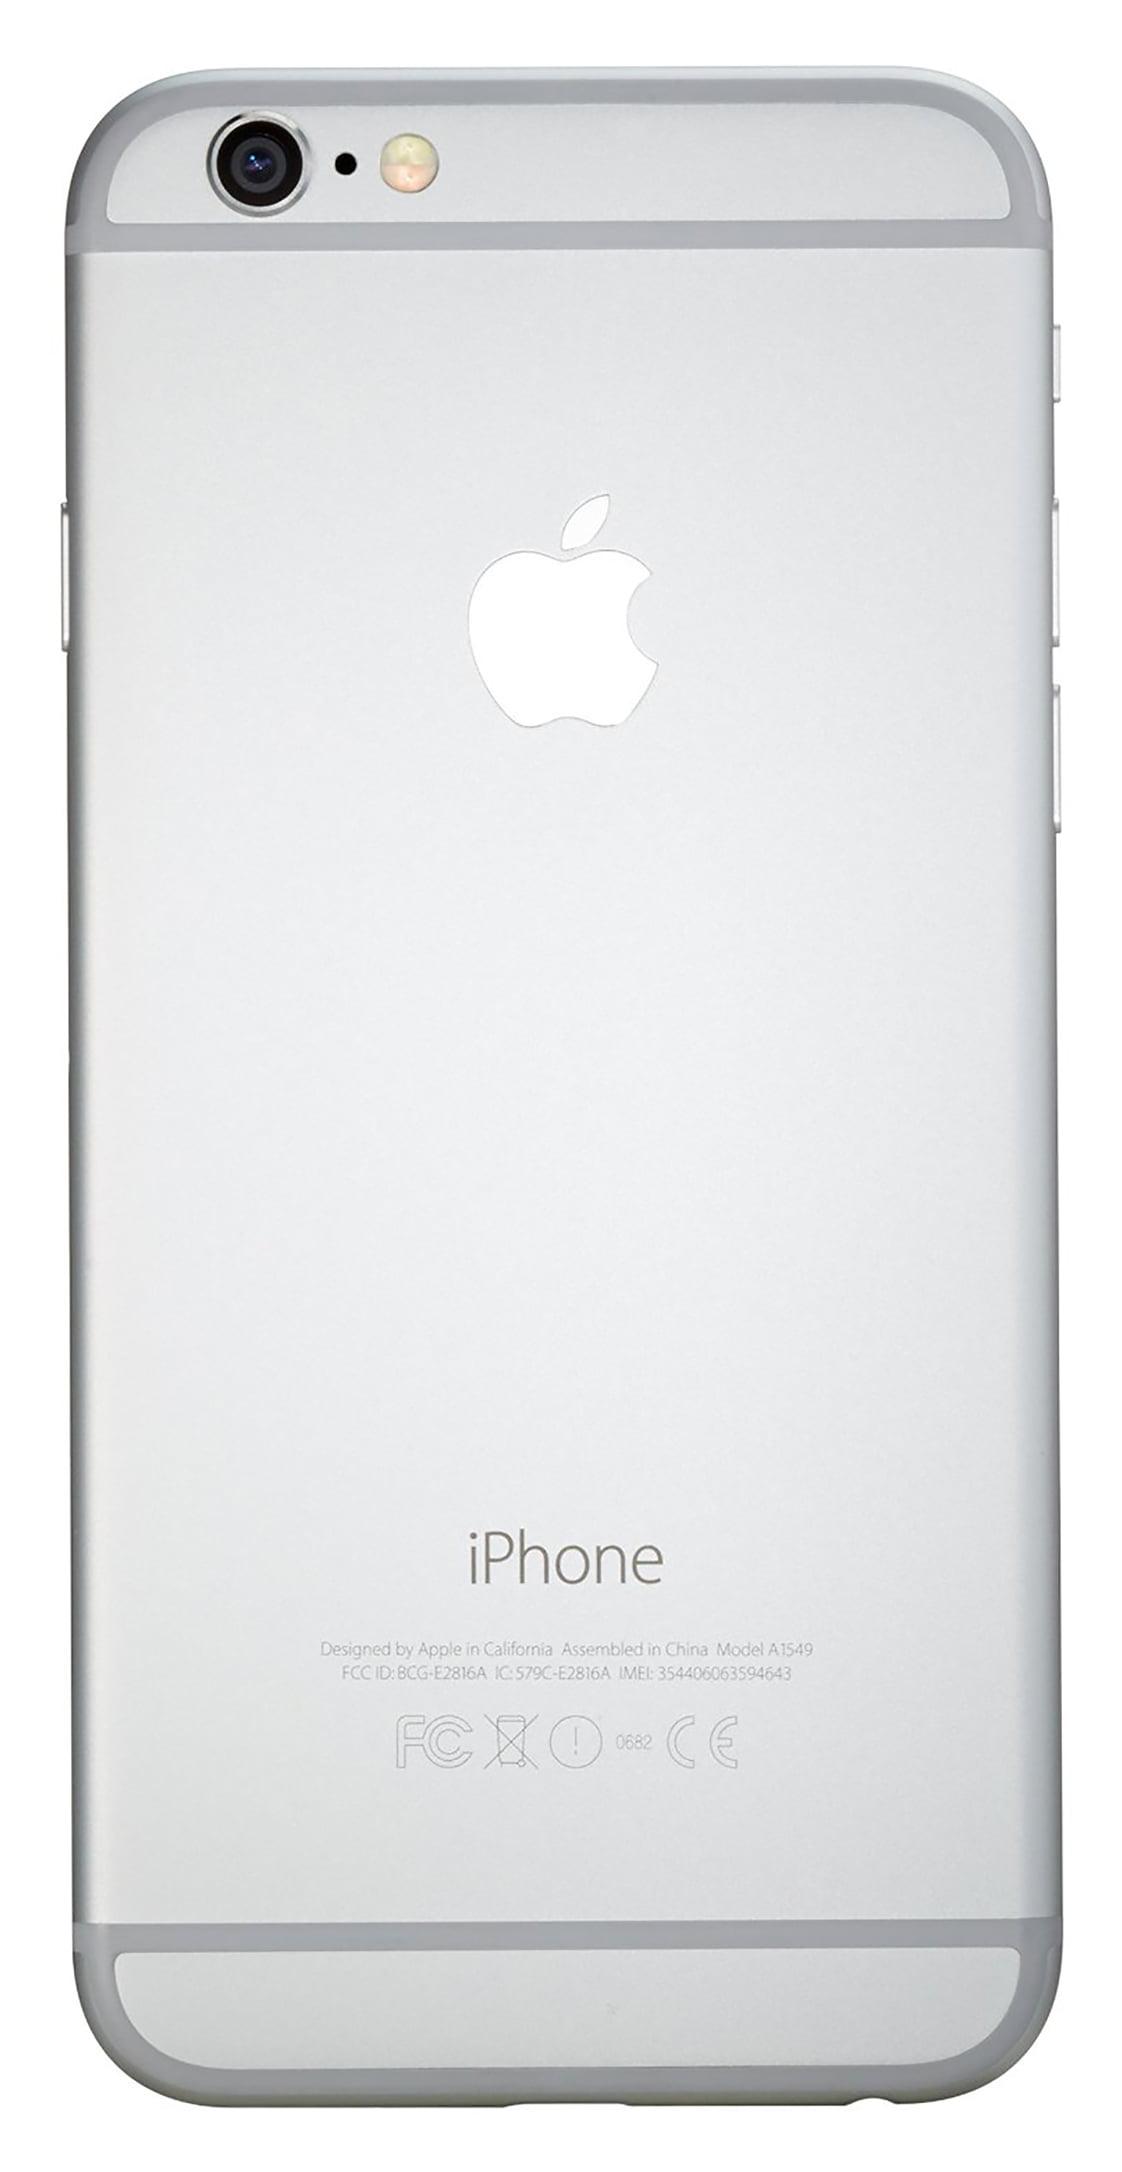 Refurbished Apple iPhone 6 Plus 16GB, Silver - Unlocked GSM